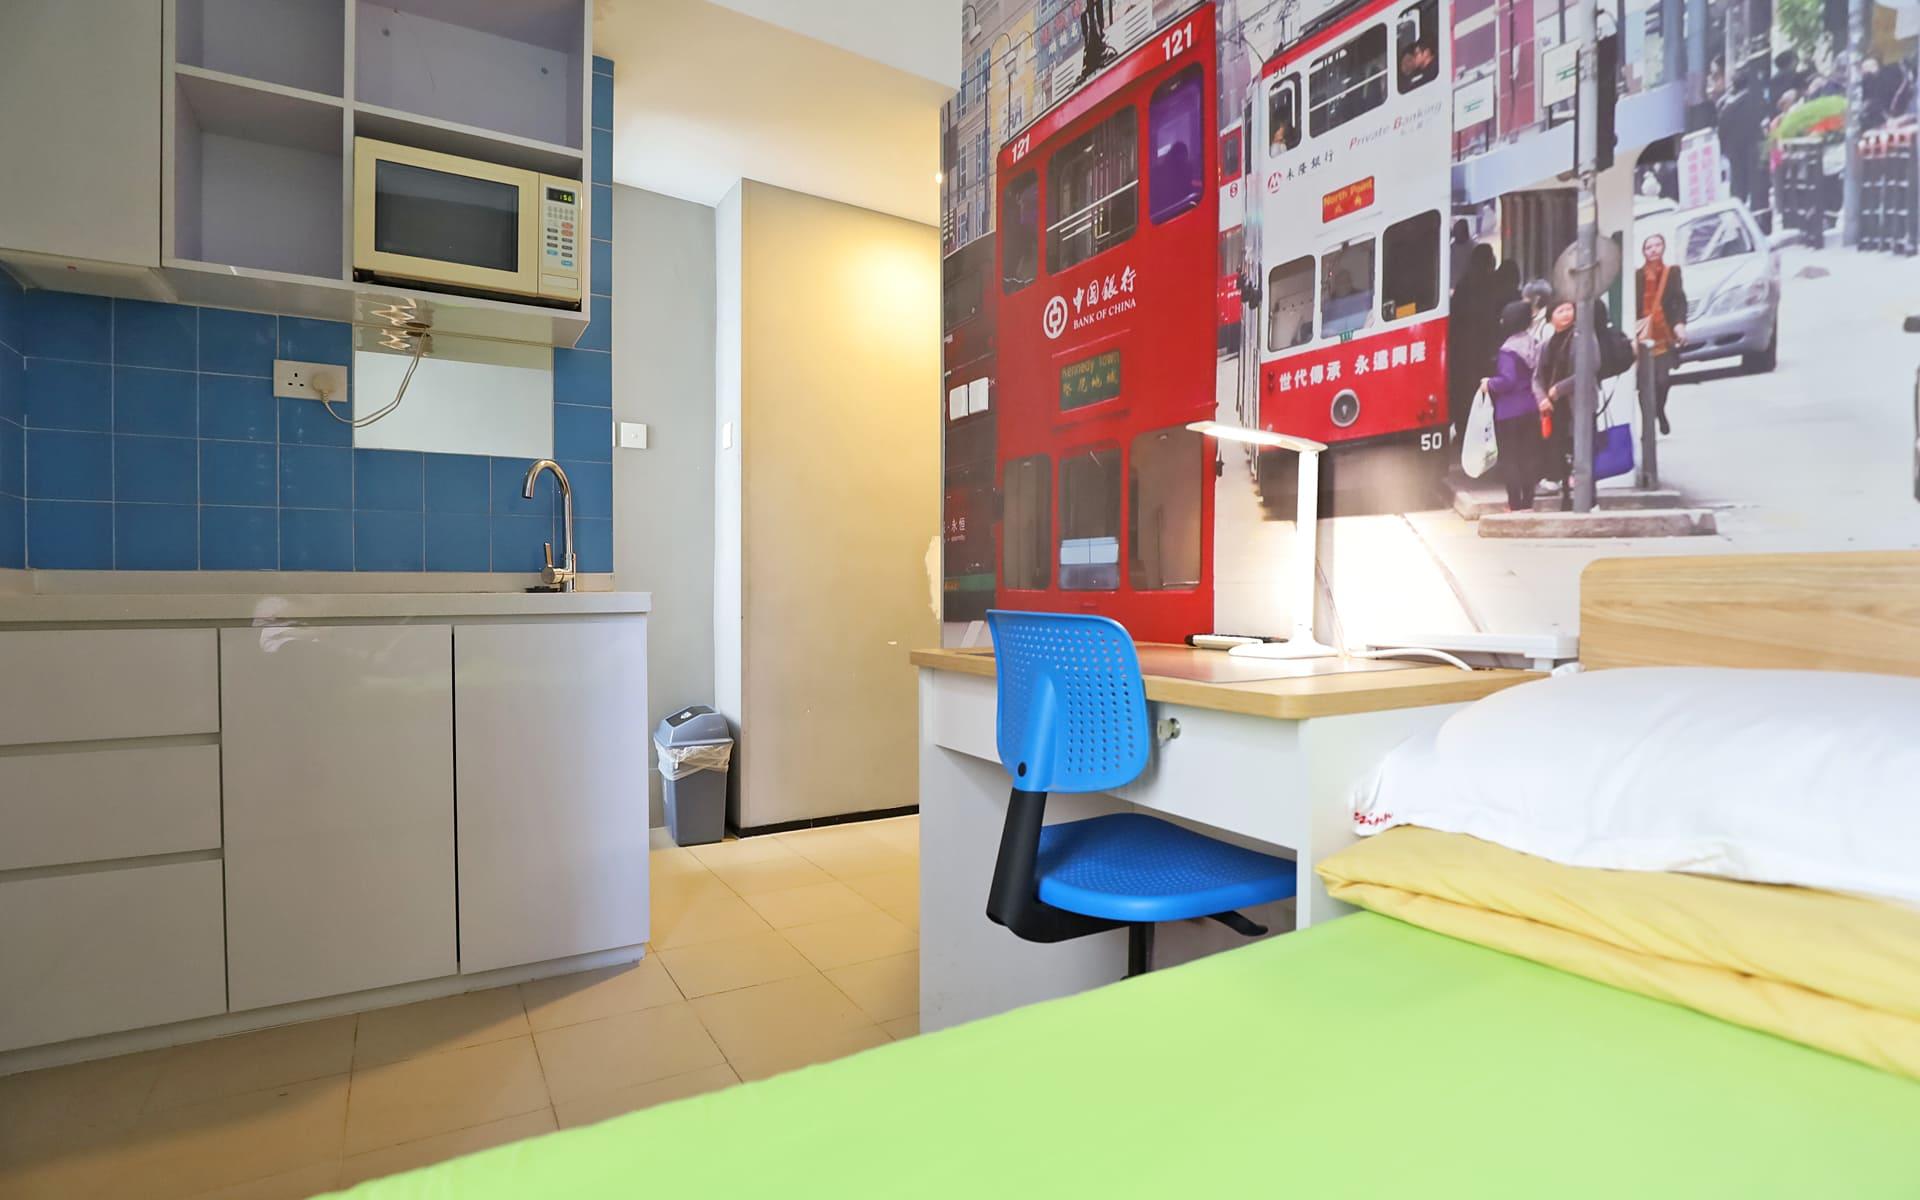 hk_service_apartment_20411139451596696820.jpg